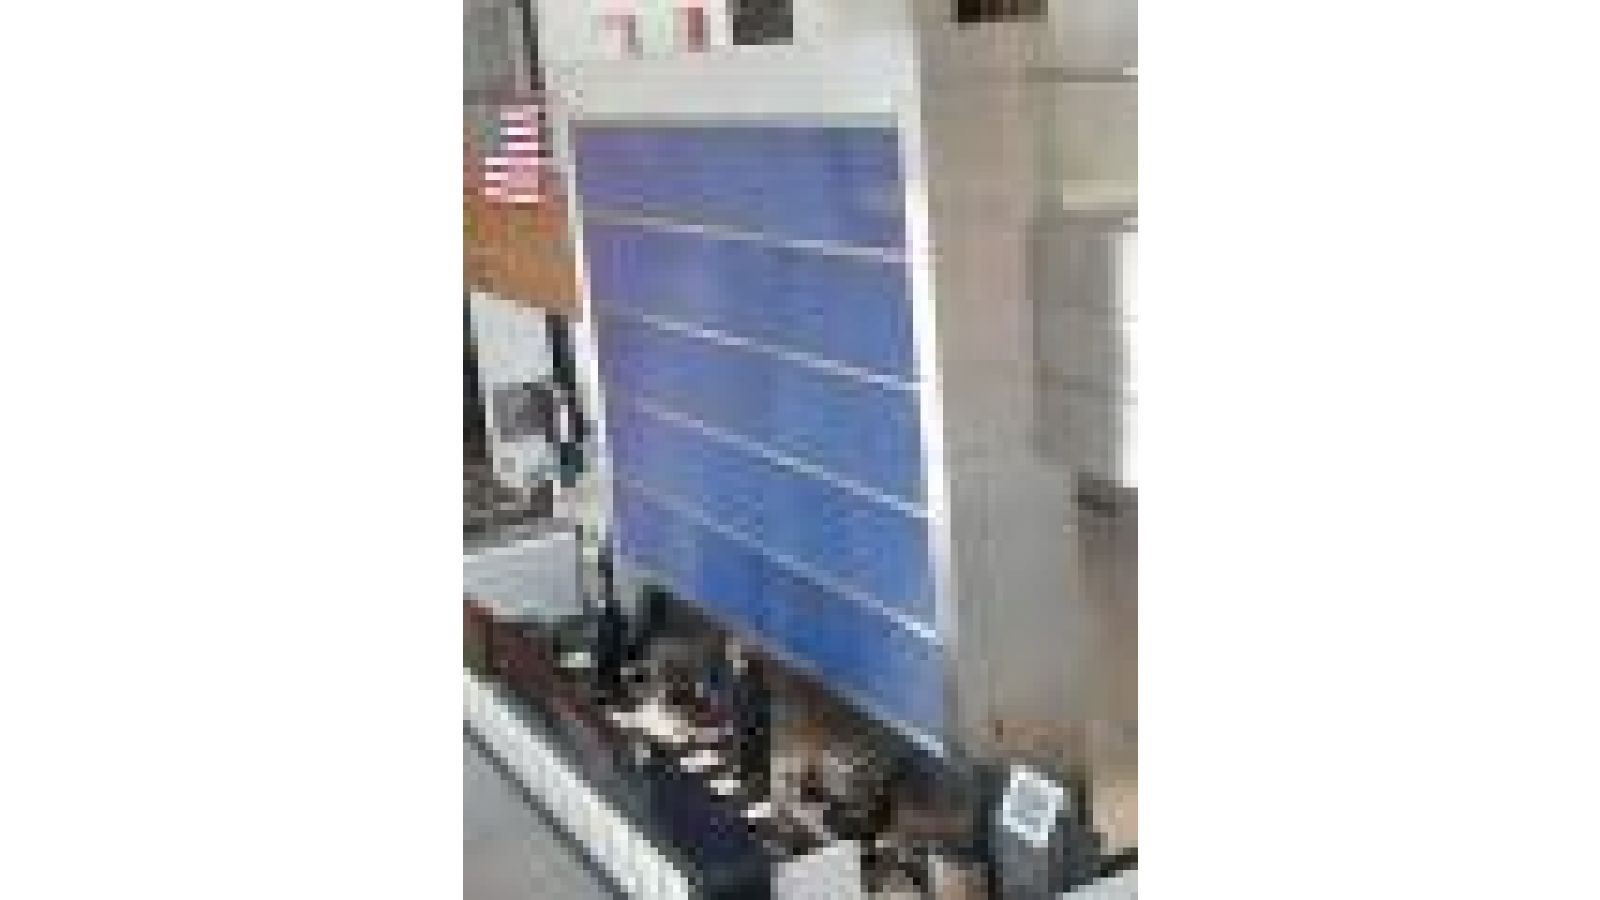 Lobby screen